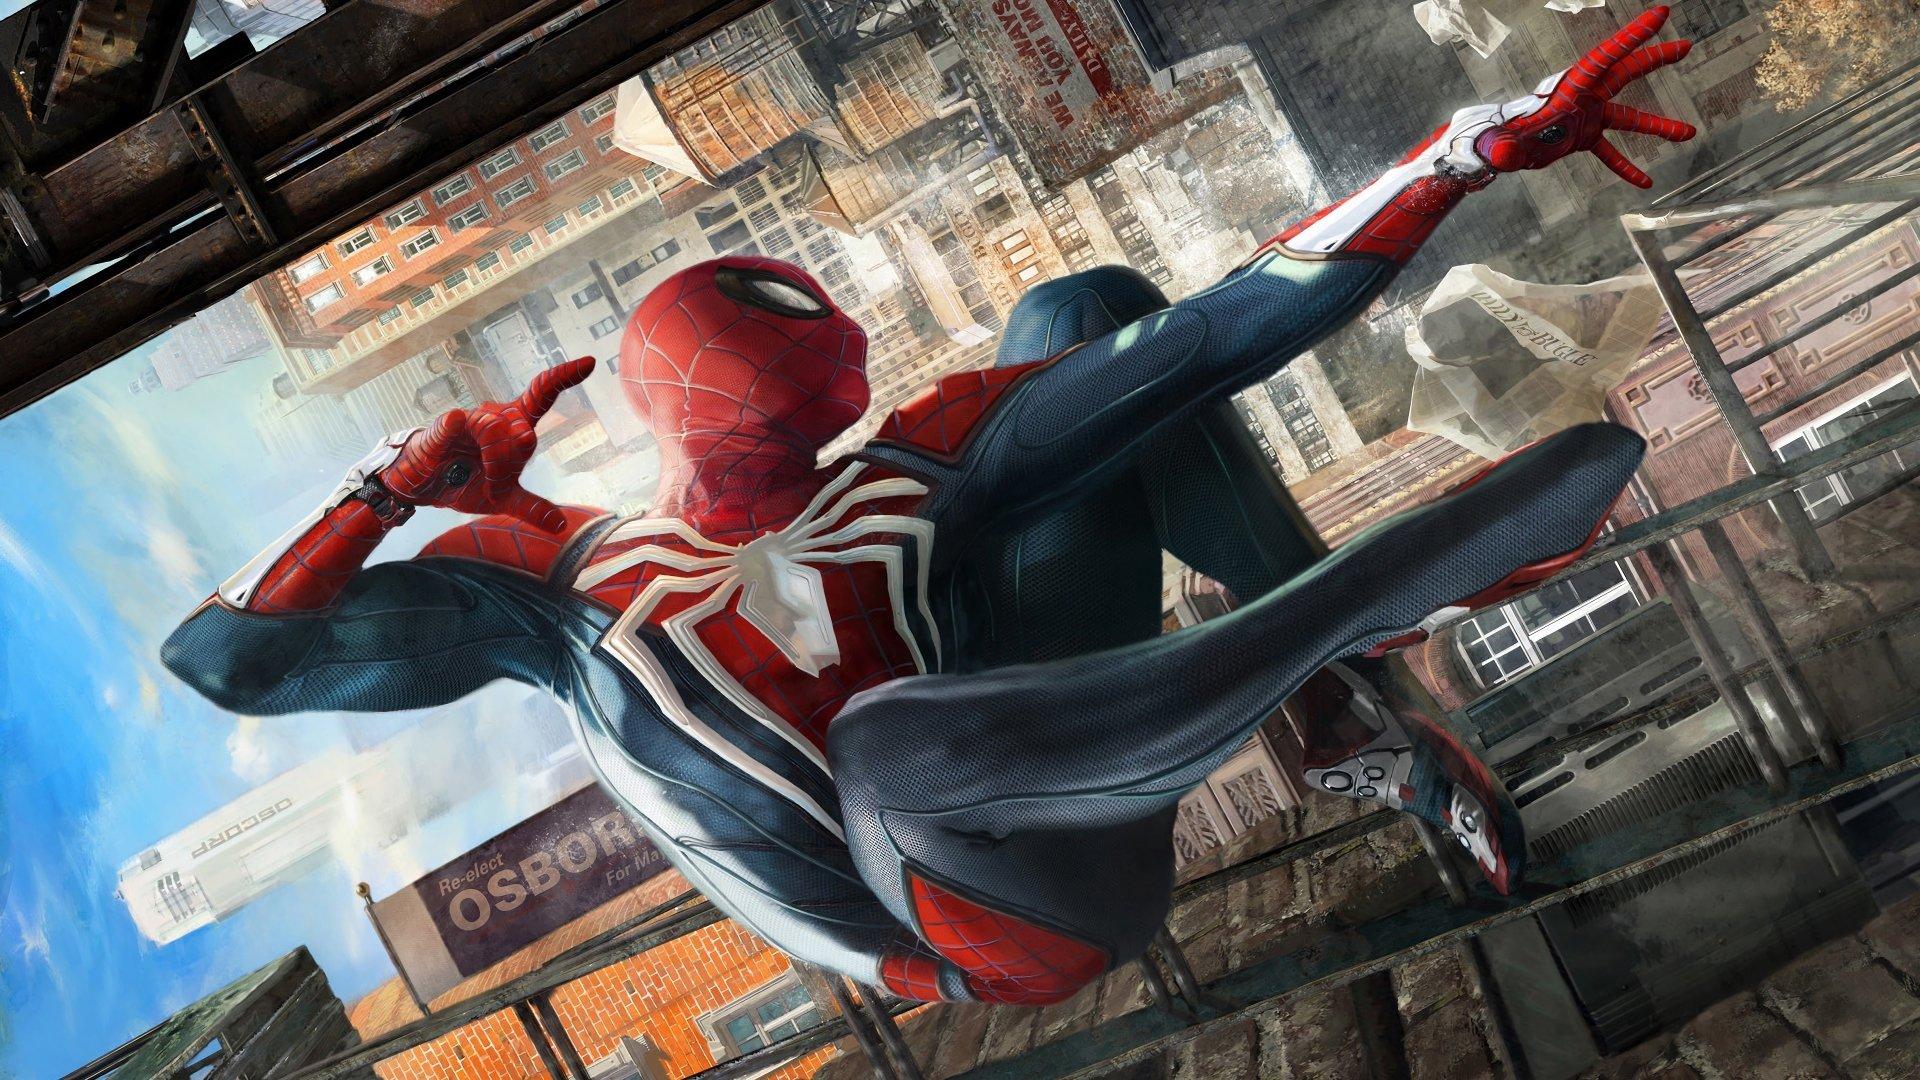 Spider man ps4 4k ultra hd wallpaper background image 3840x2160 id 941221 wallpaper abyss - Marvel hd wallpapers 4k ...